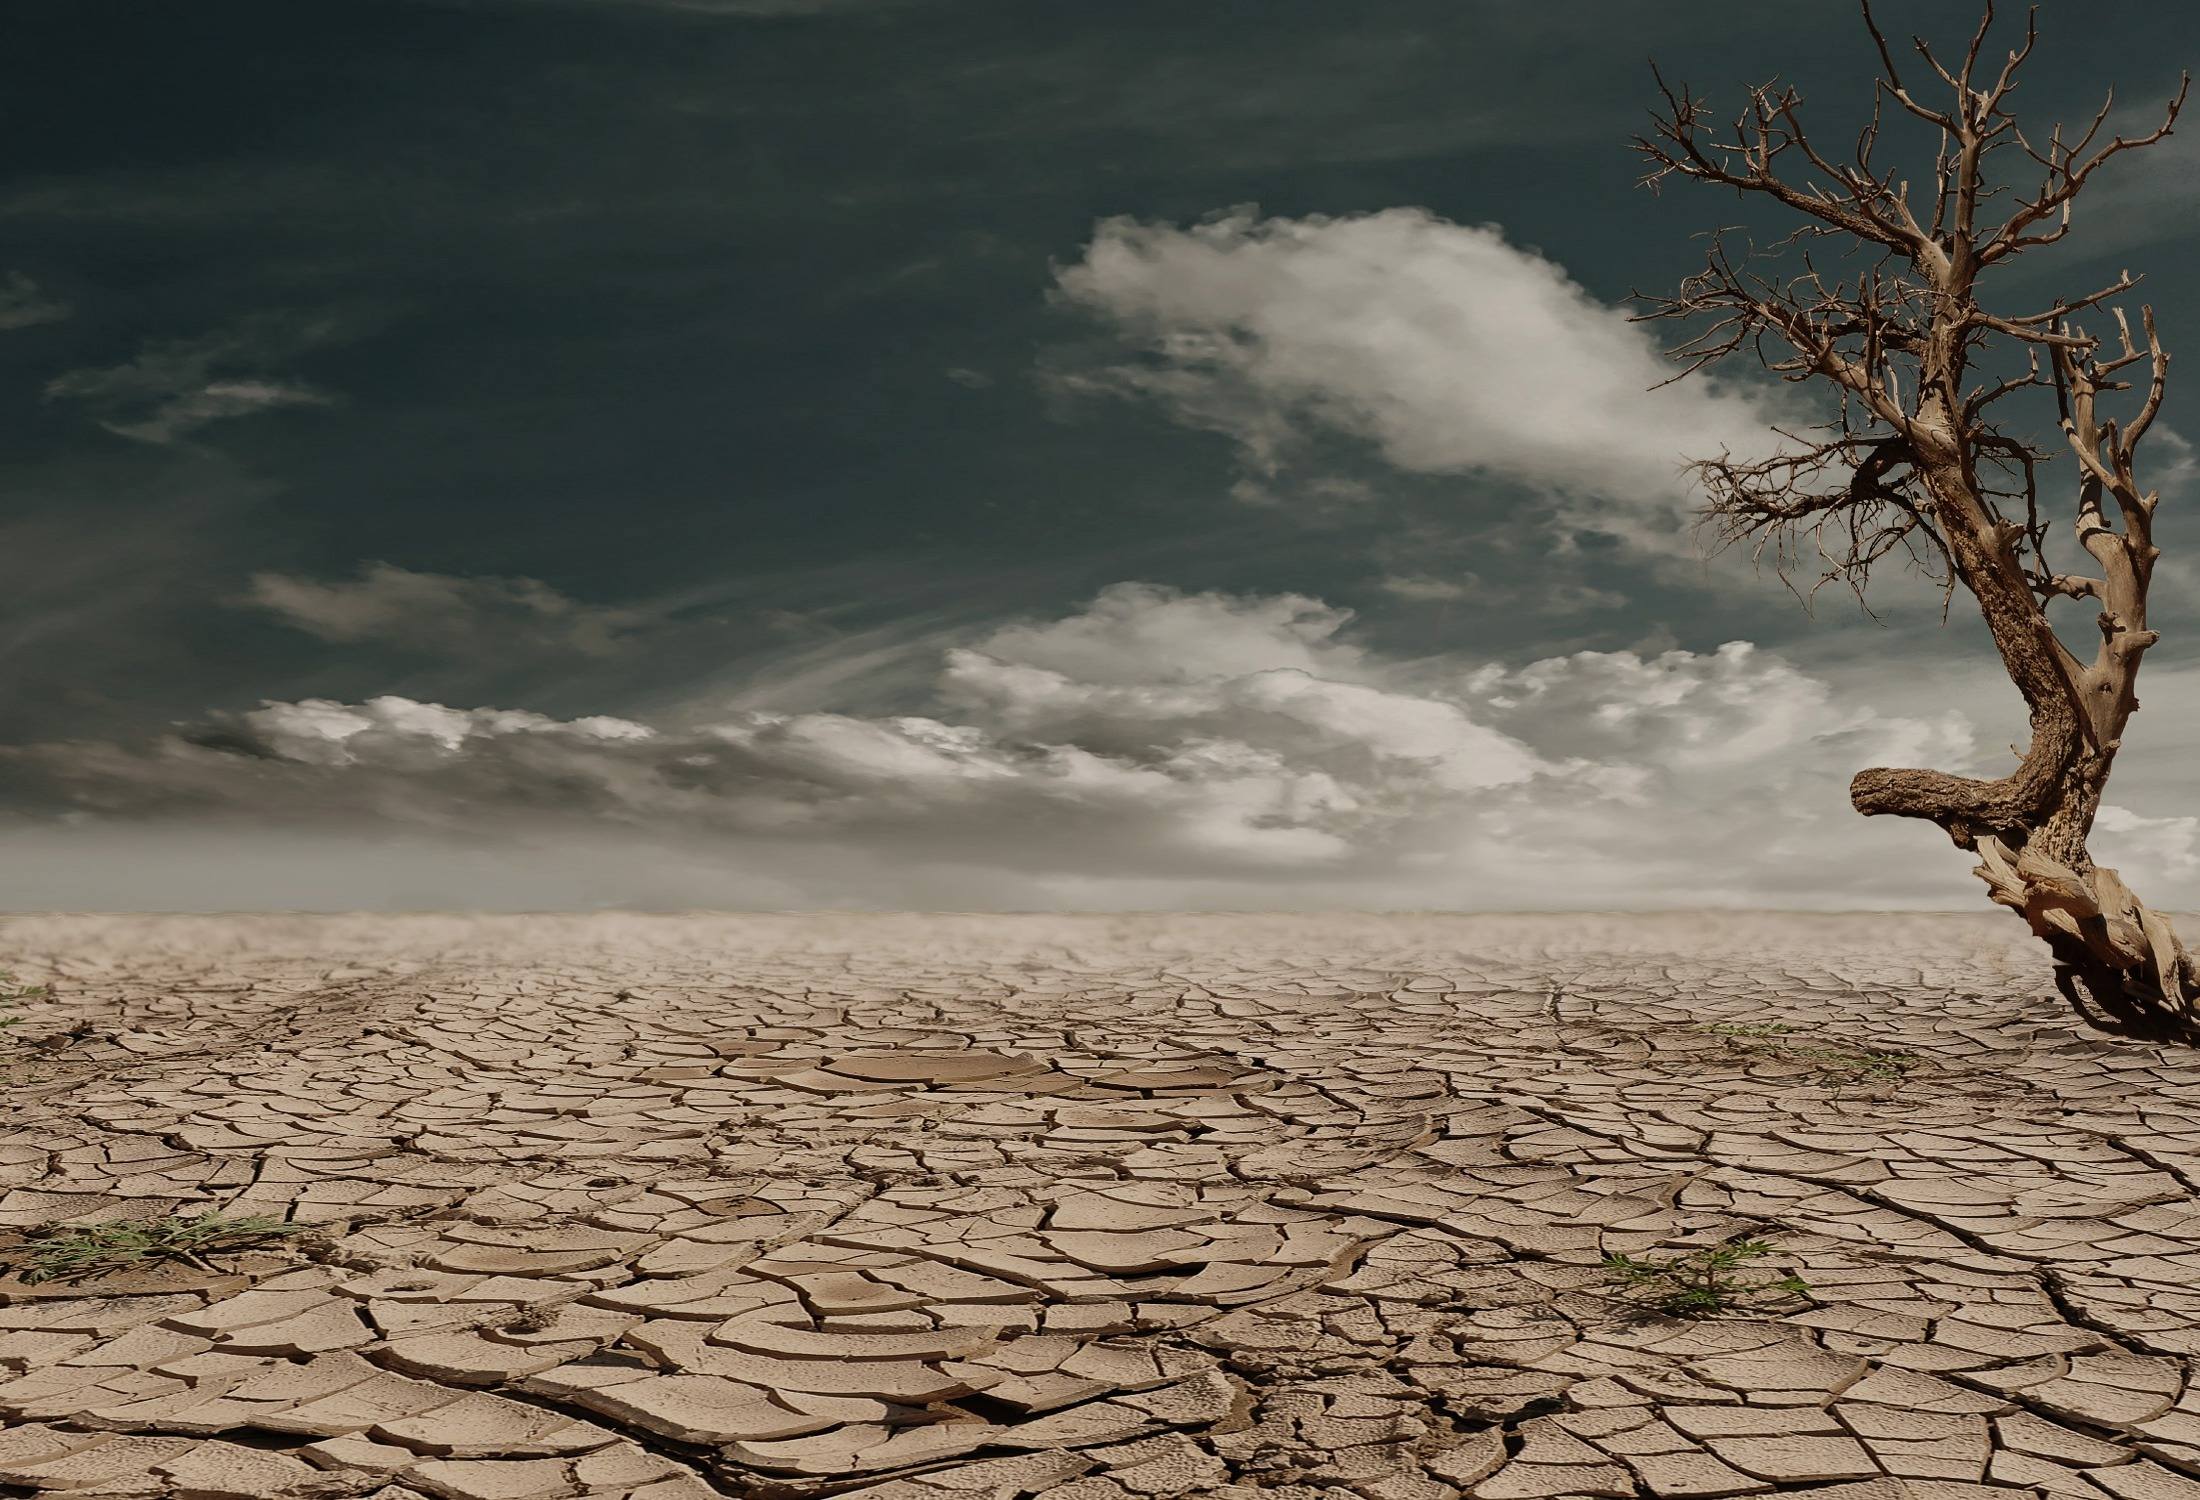 desert-drought-dehydrated-clay-soil-60013-1.jpg